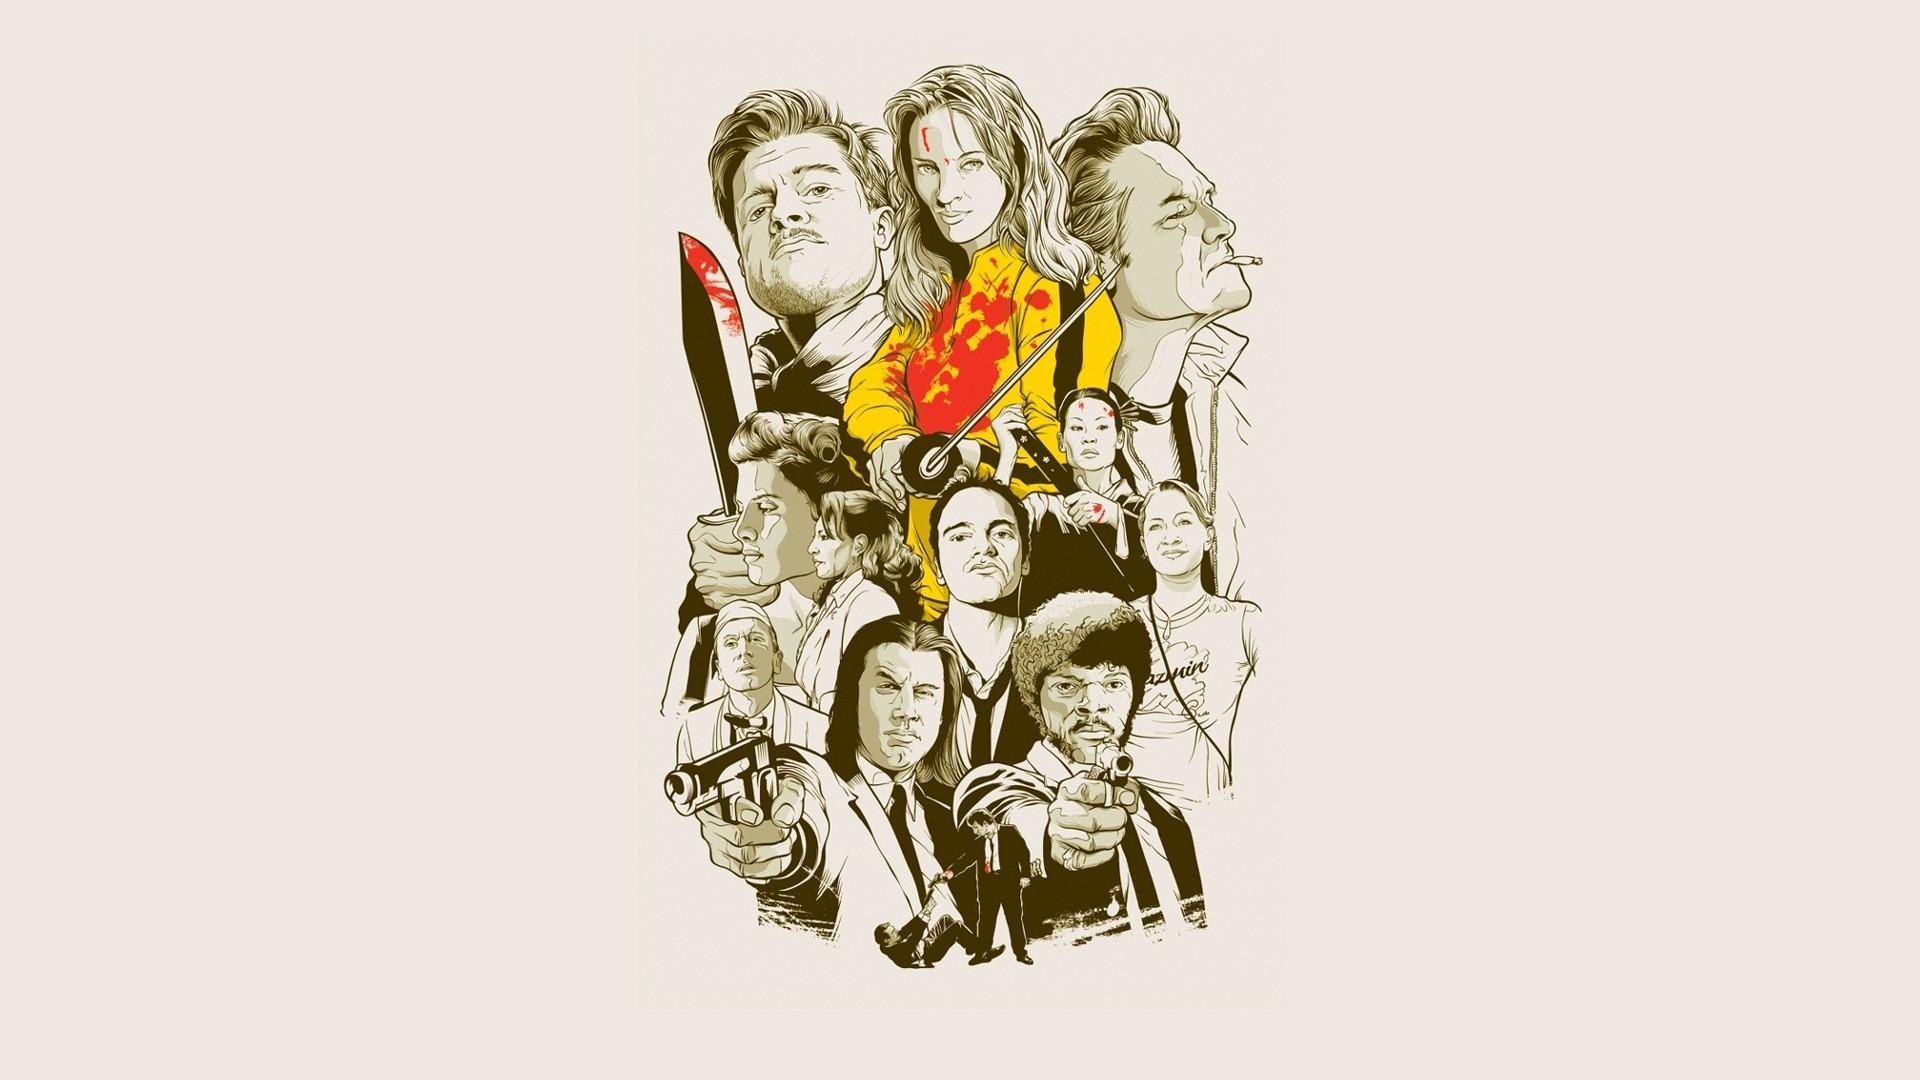 Quentin Tarantino pictures · Quentin Tarantino wallpapers desktop